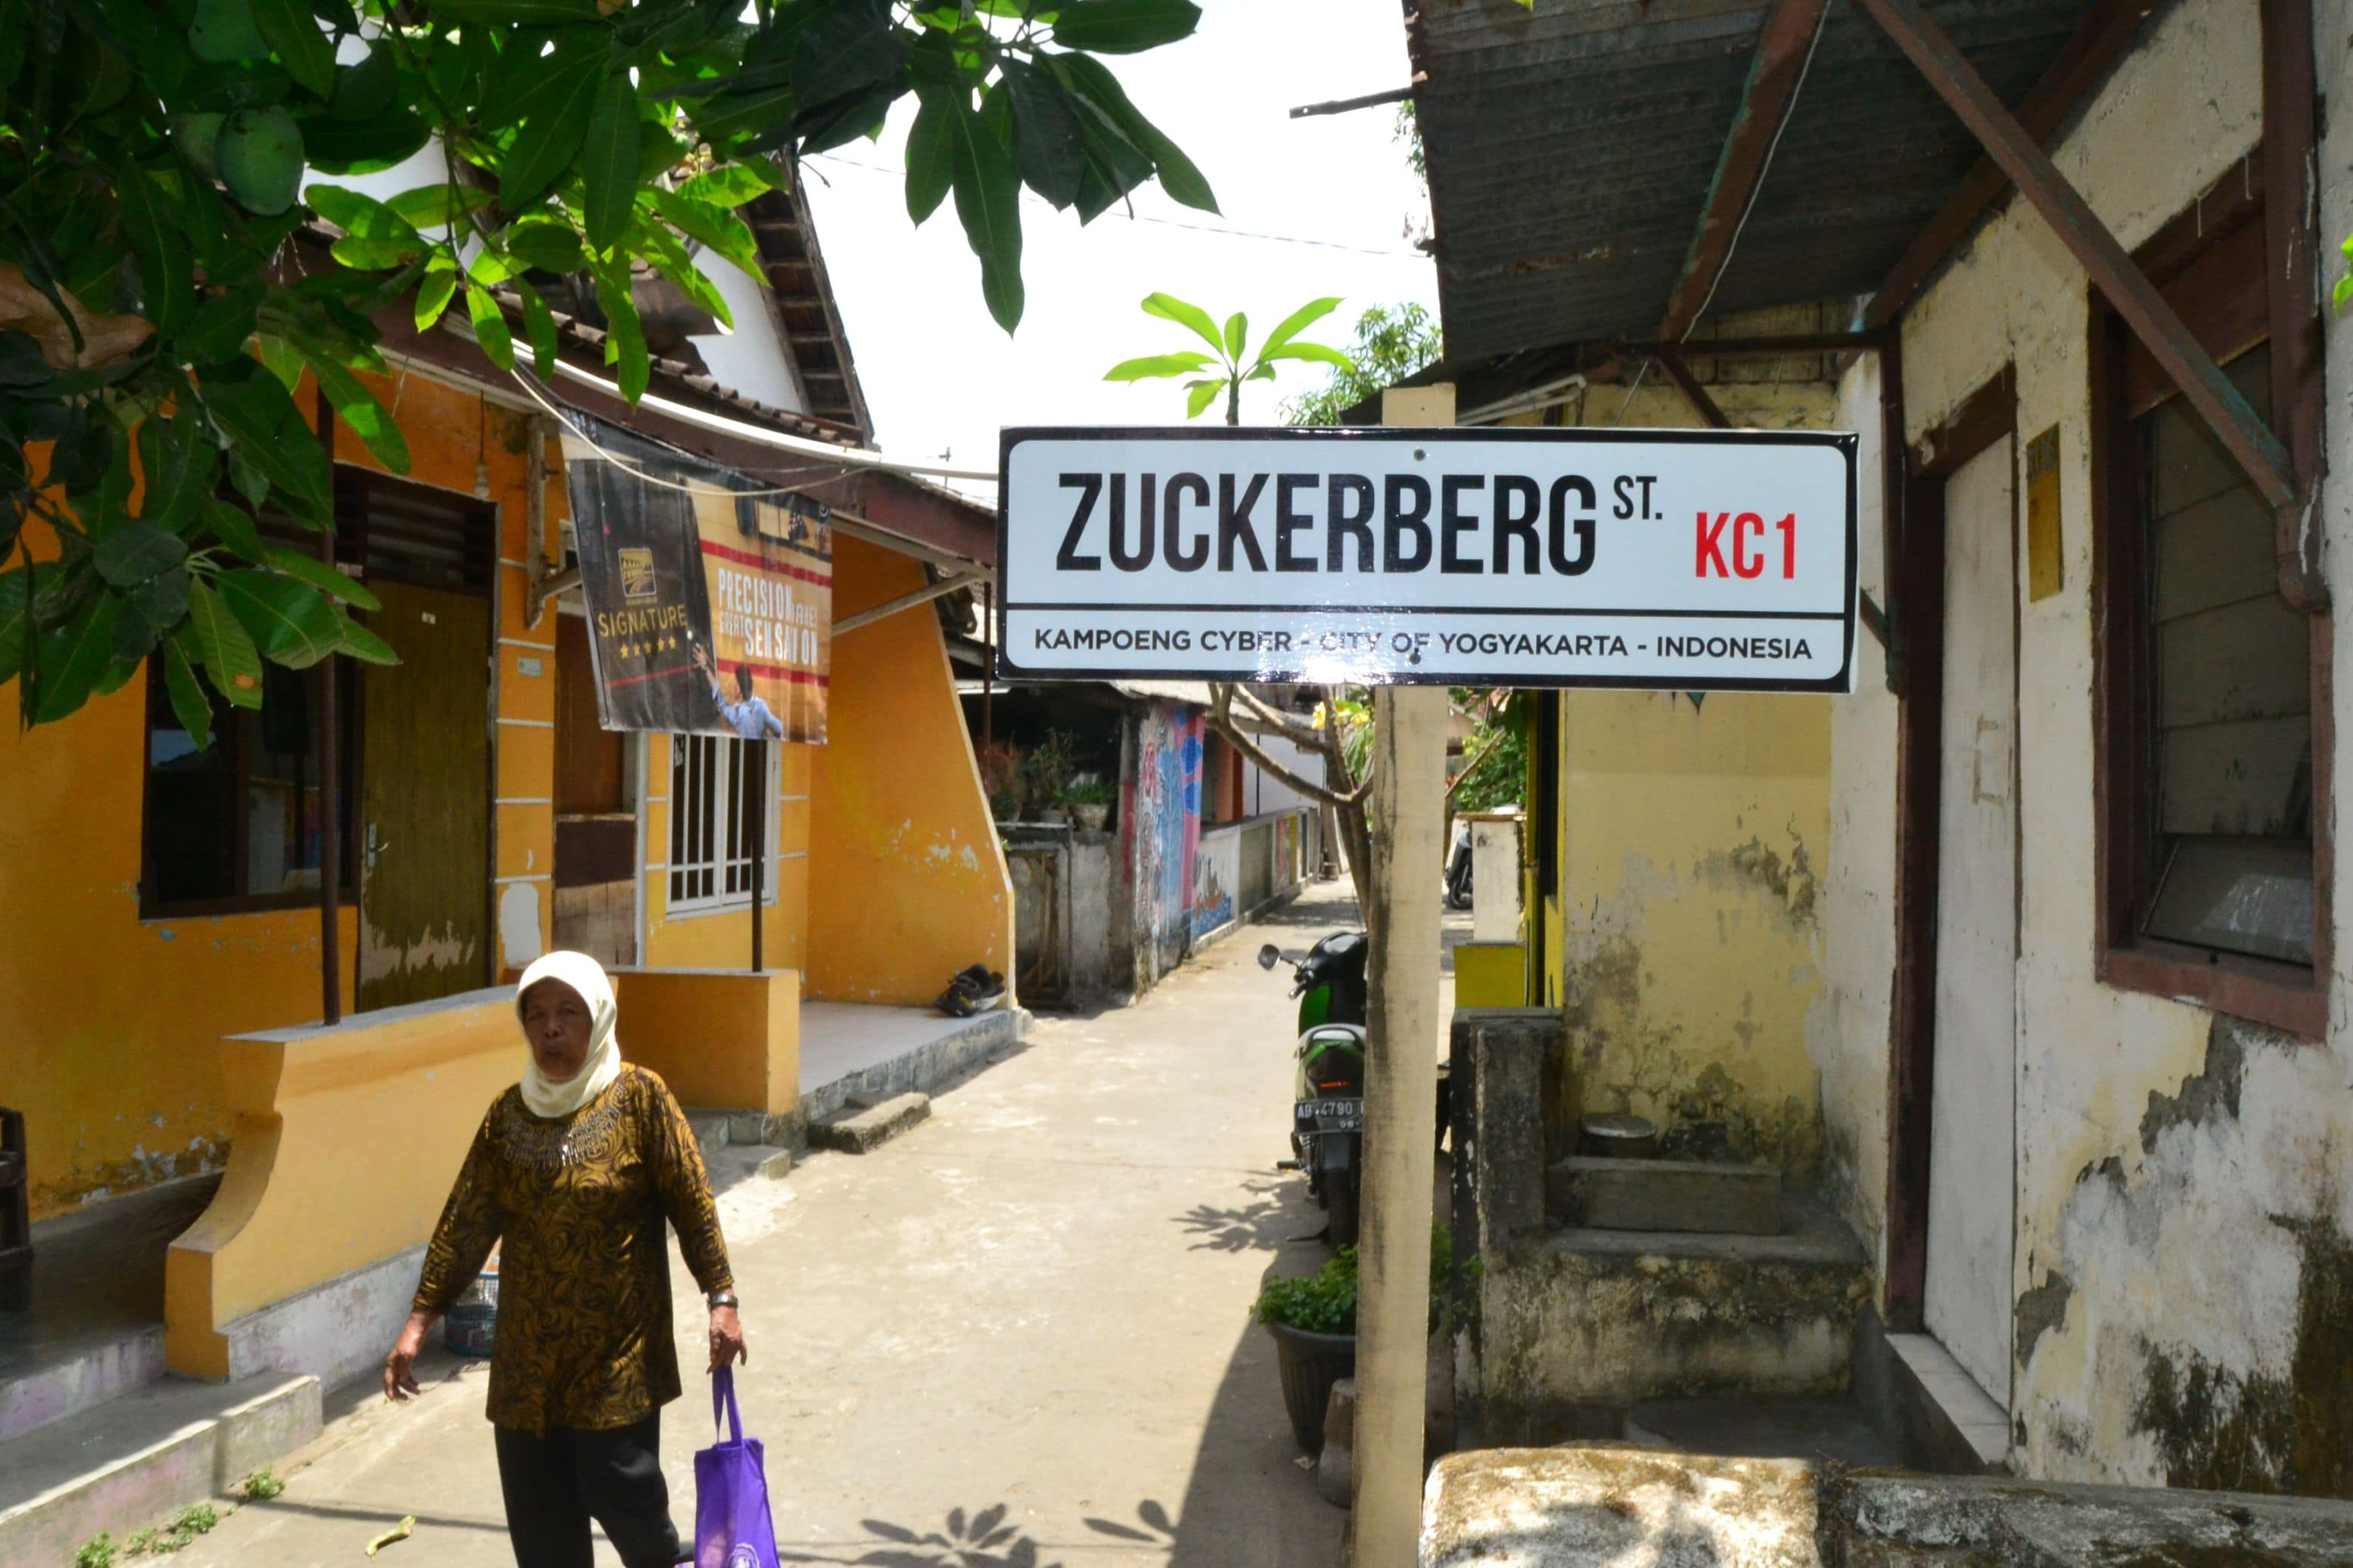 Zuckerberg ST. Plank Di Kampung Cyber Yogyakarta